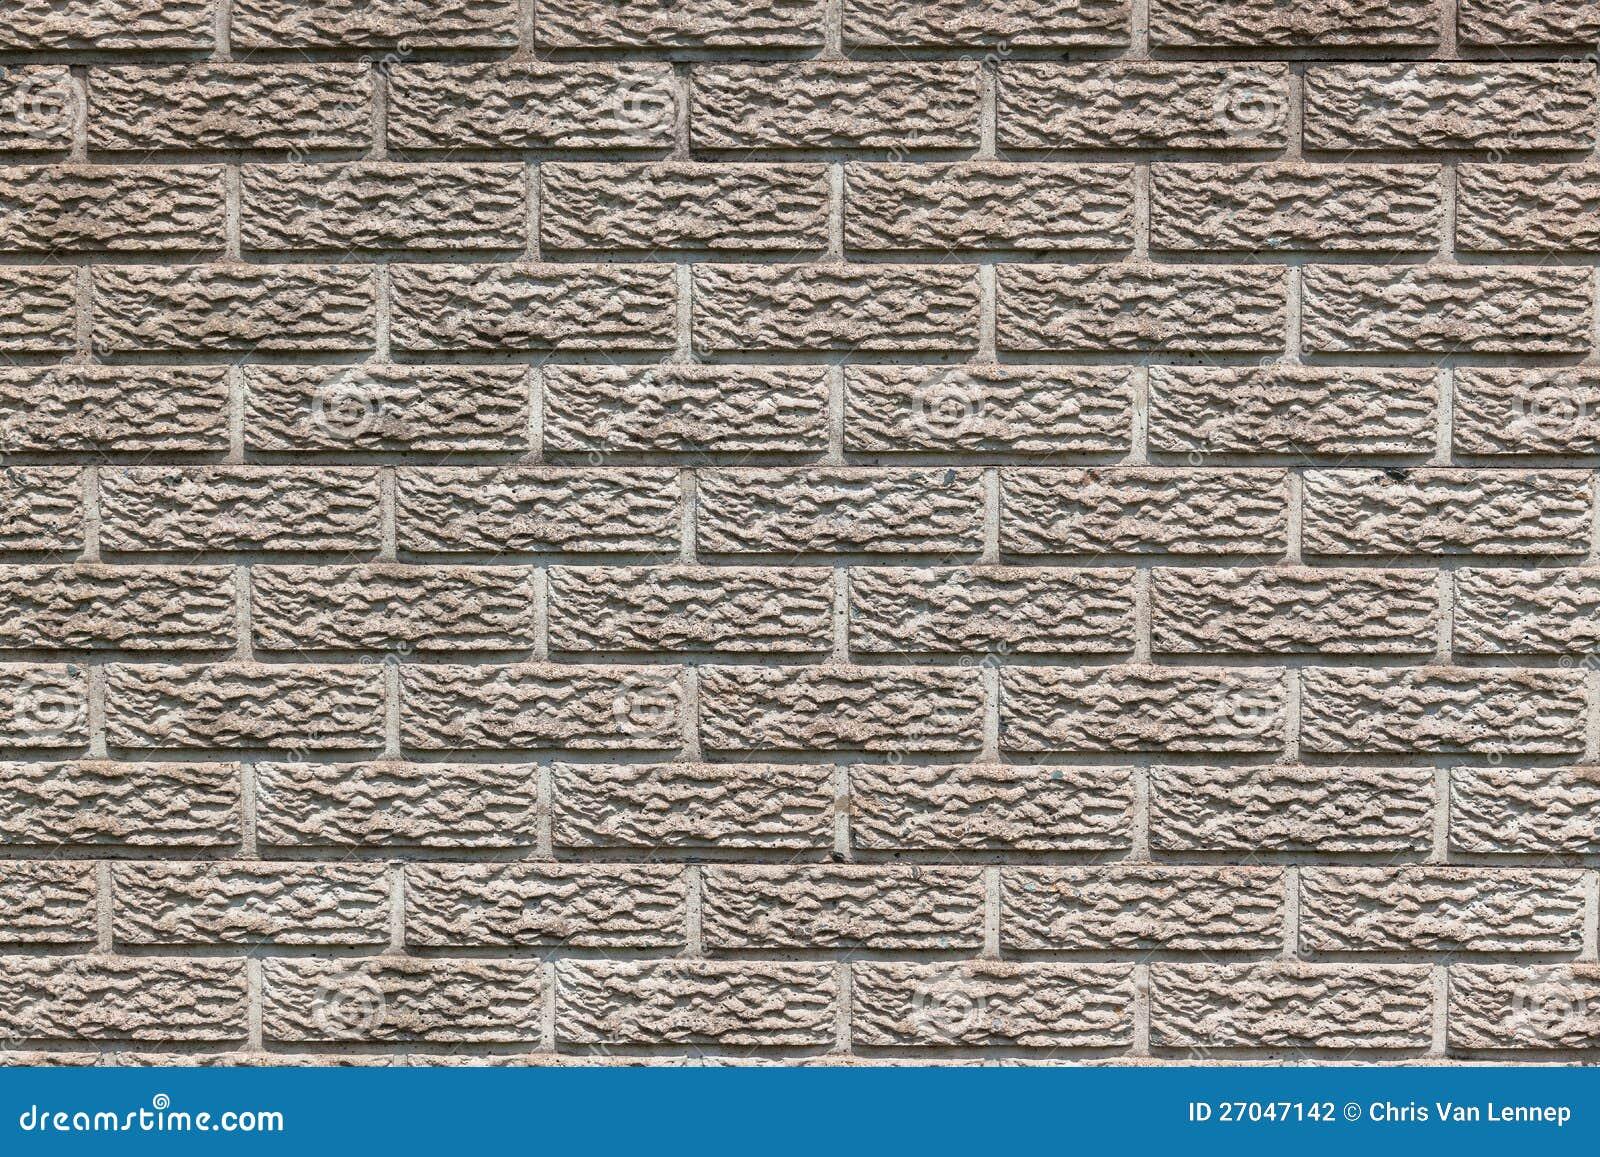 Concrete Brick Design Fence Stock Photography Image